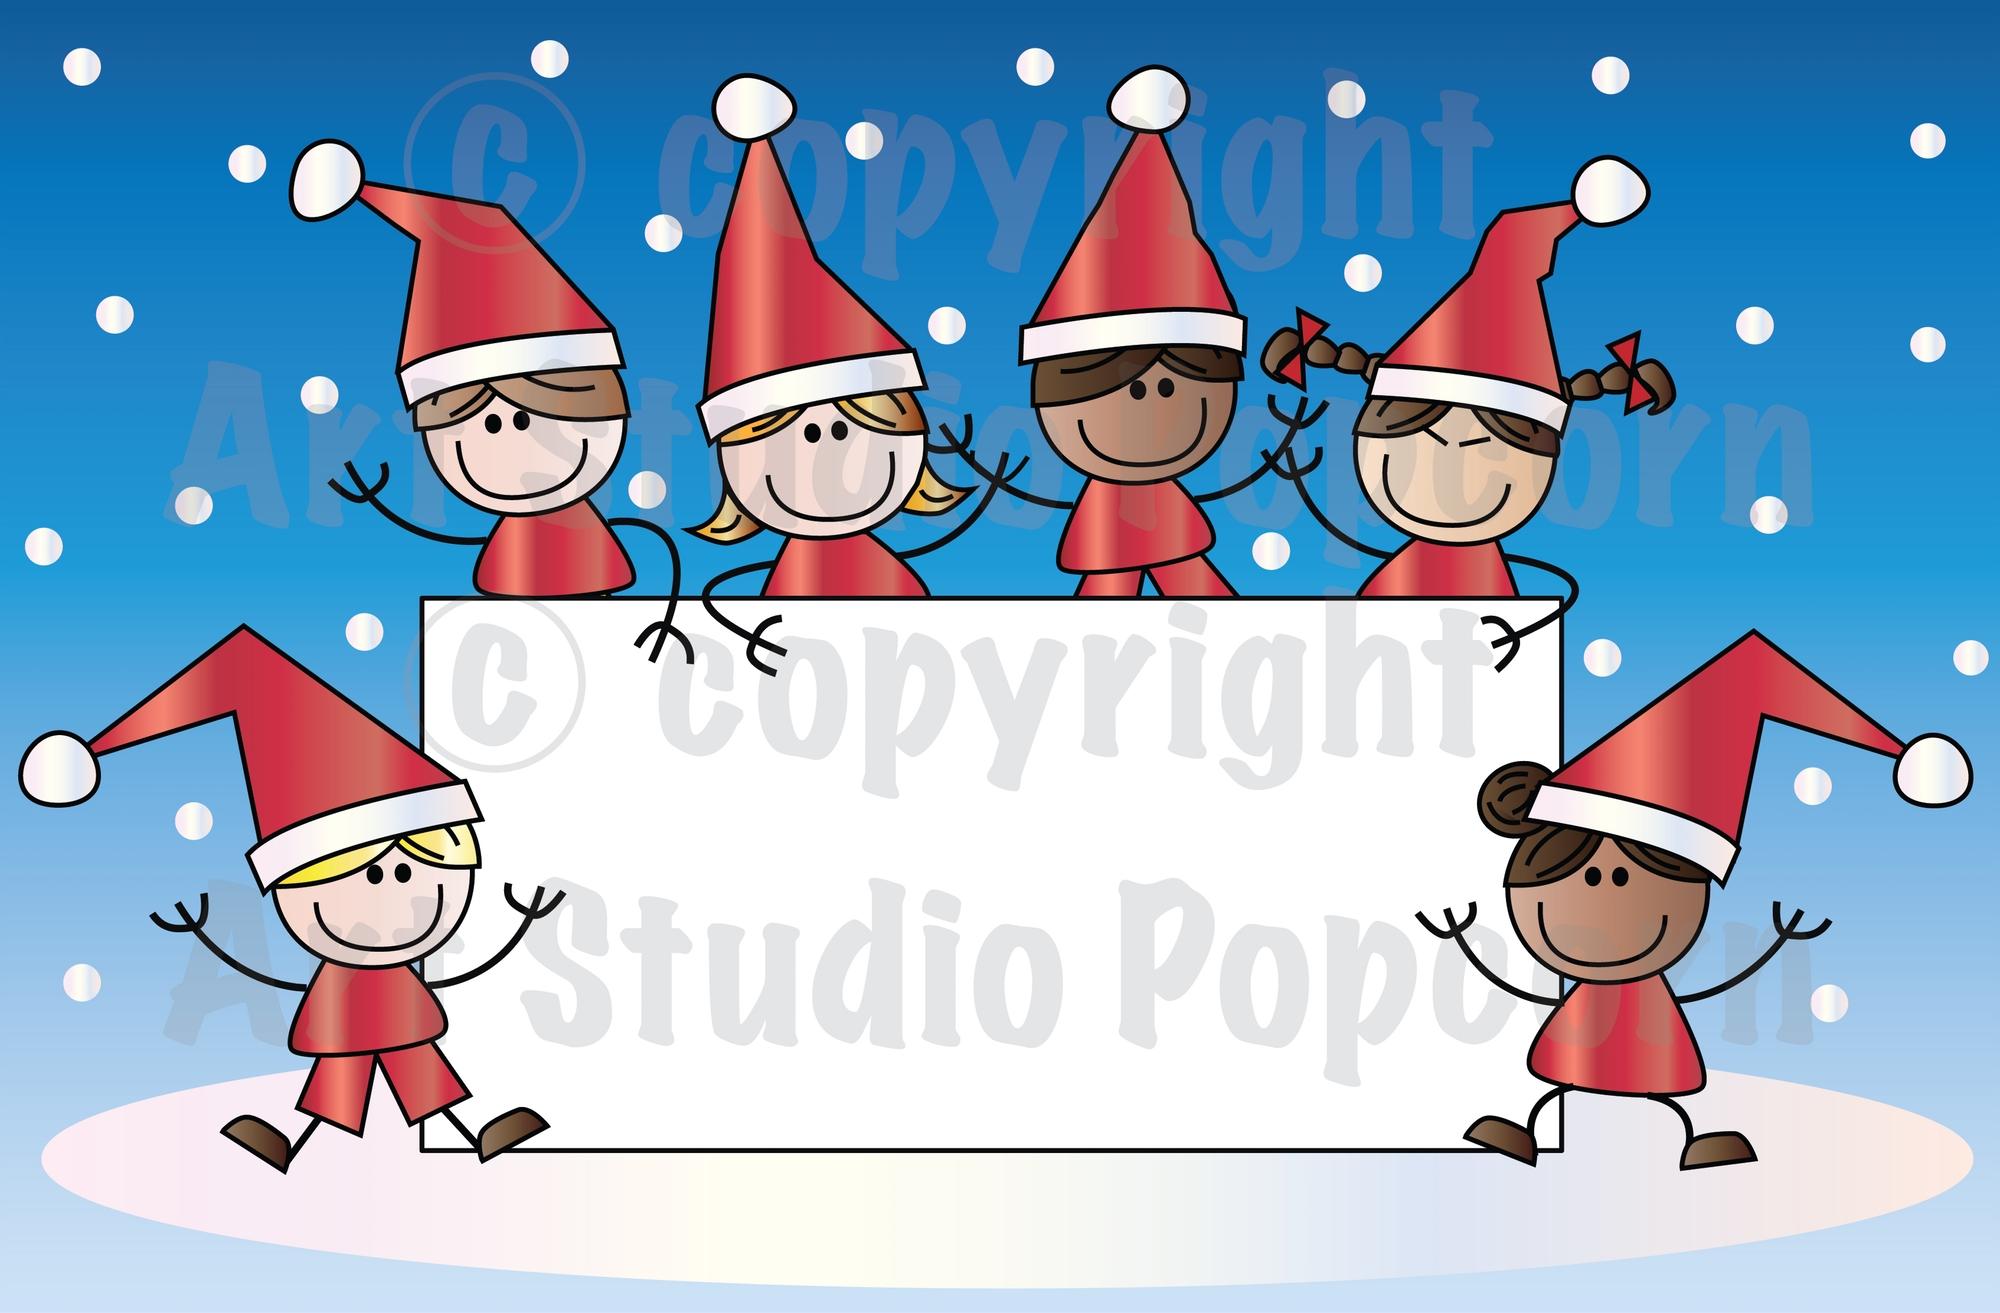 Holydays clipart popcorn Happy 494 ART Holidays no